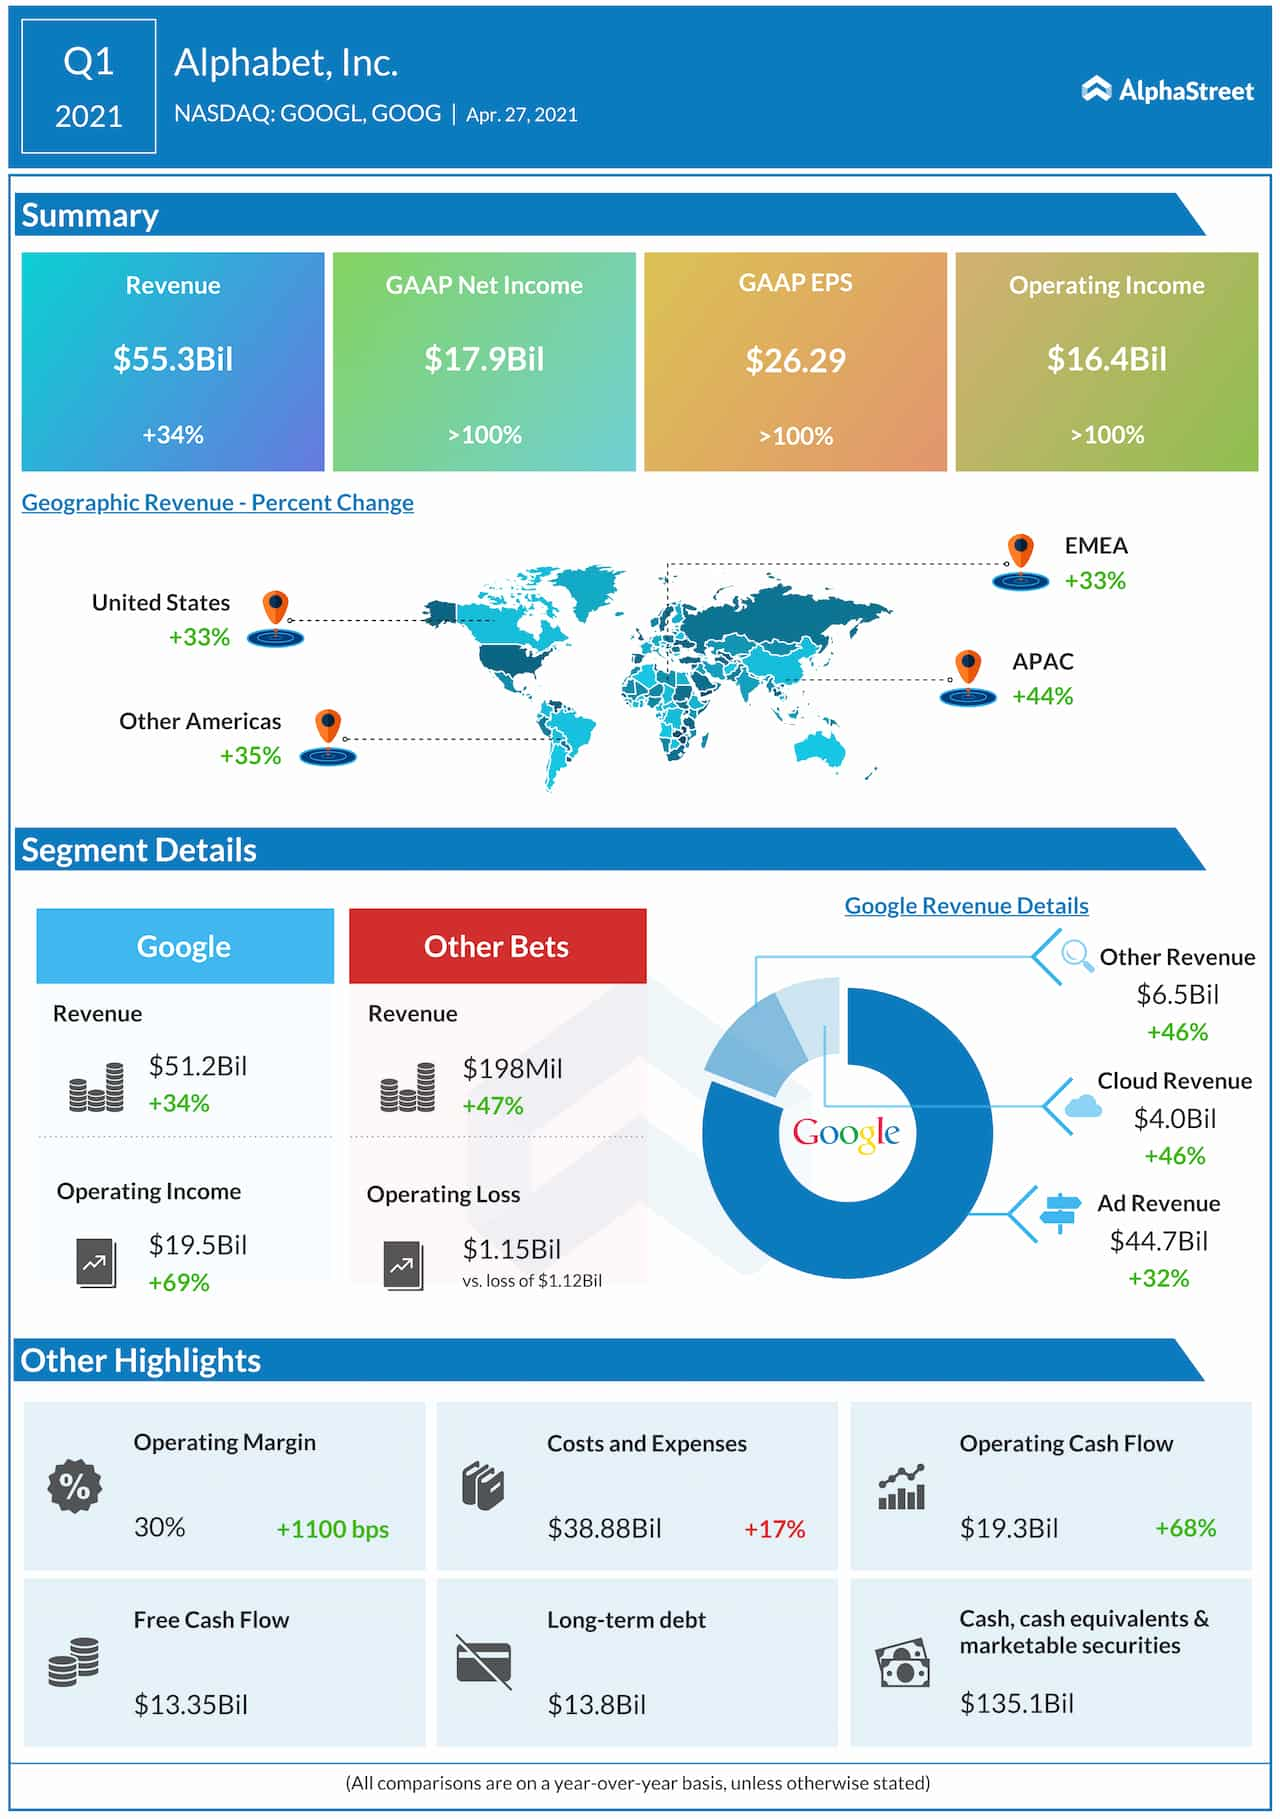 Alphabet Q1 2021 earnings infographic